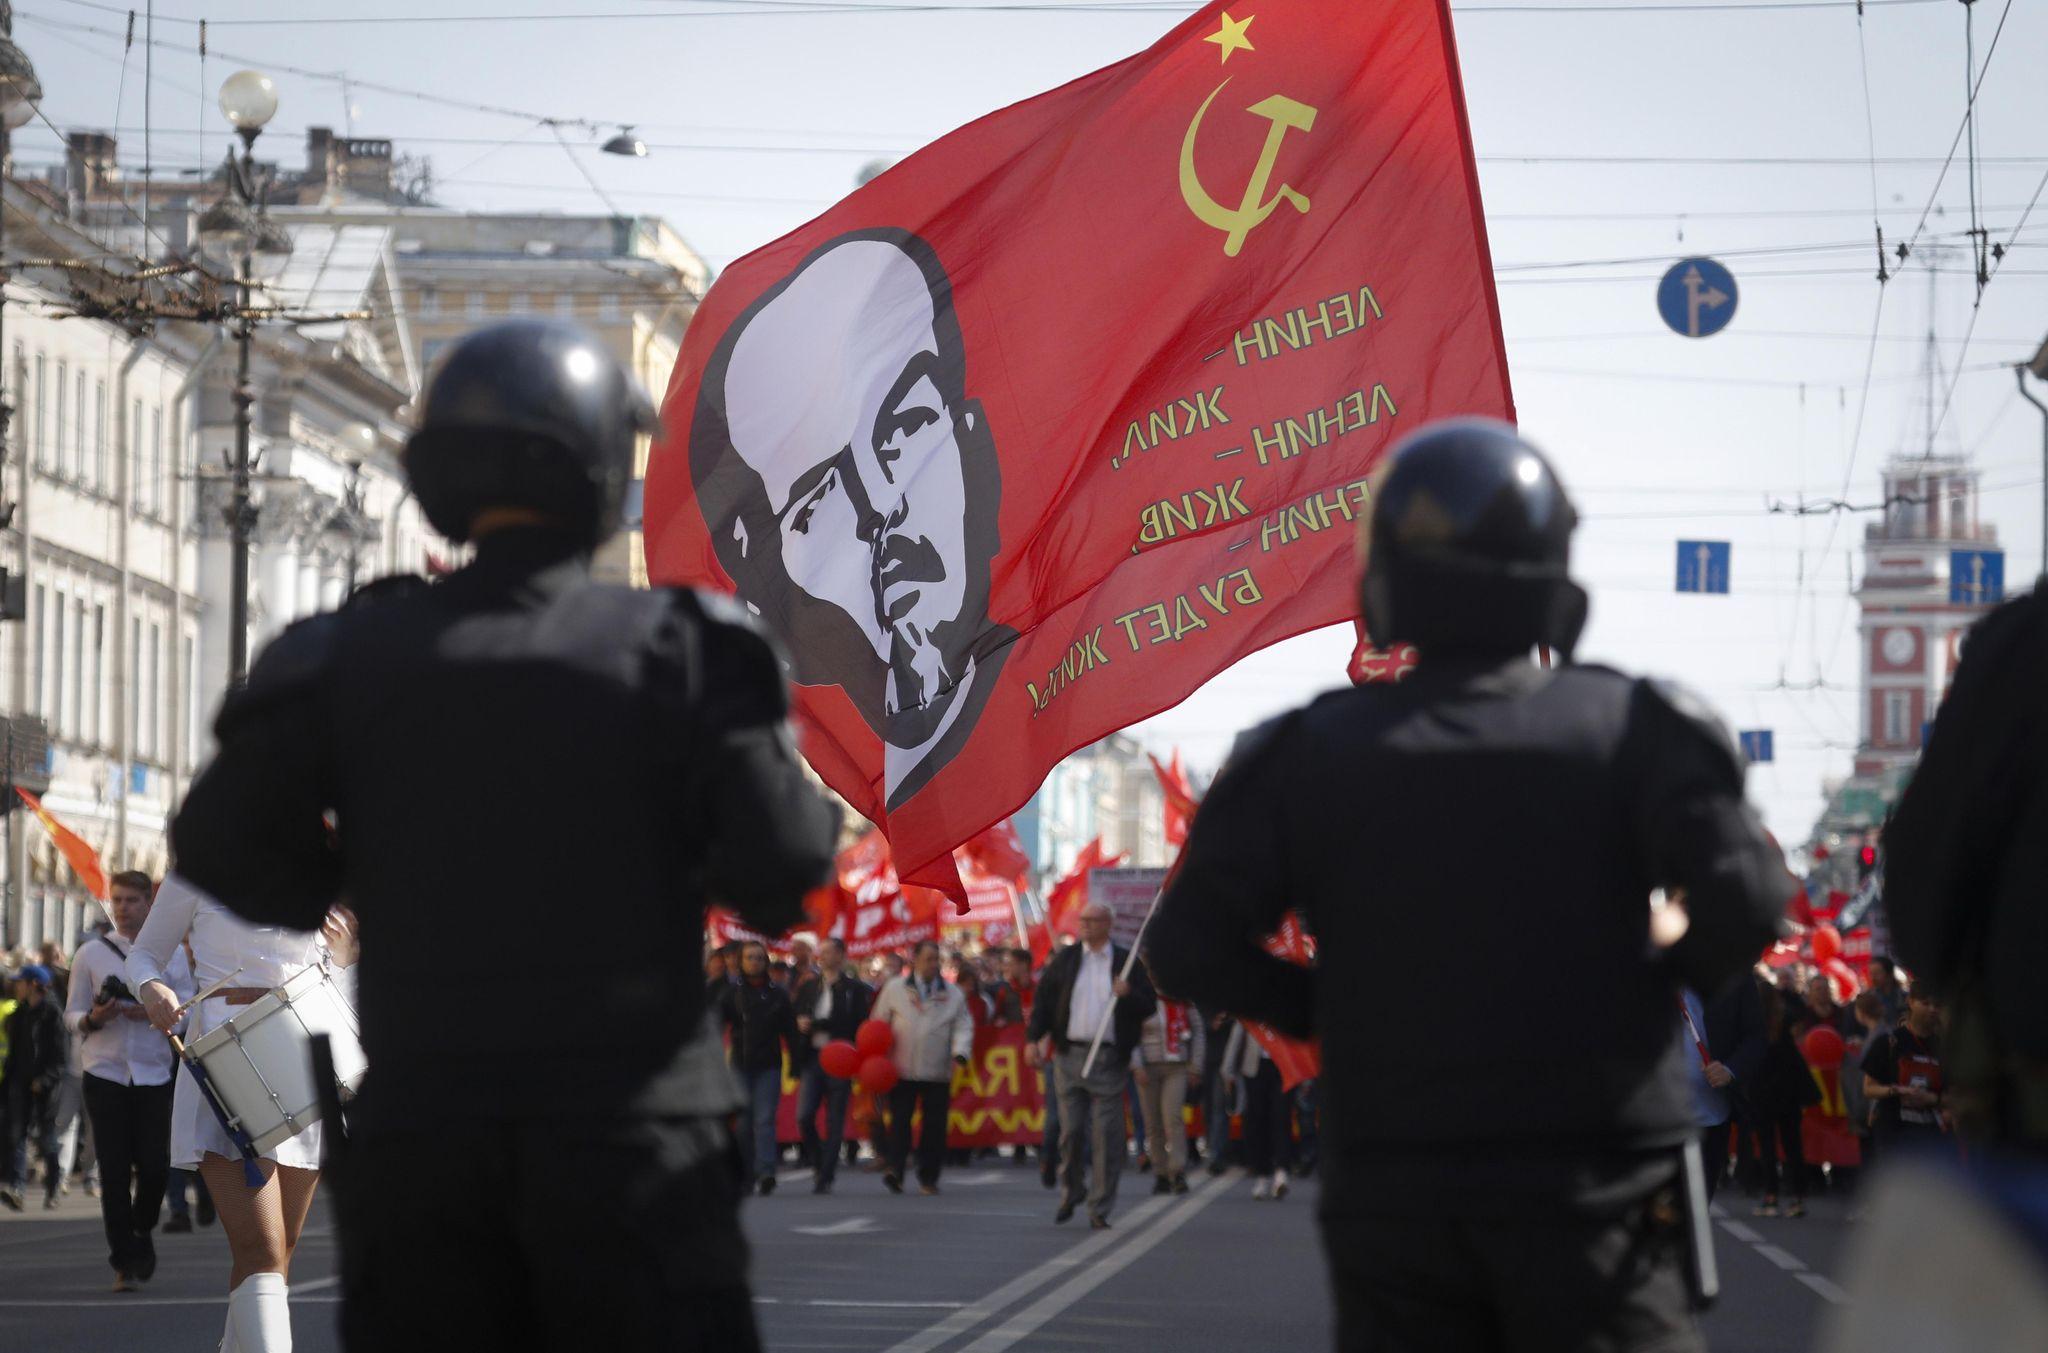 Socialist seduction poses dangers at home